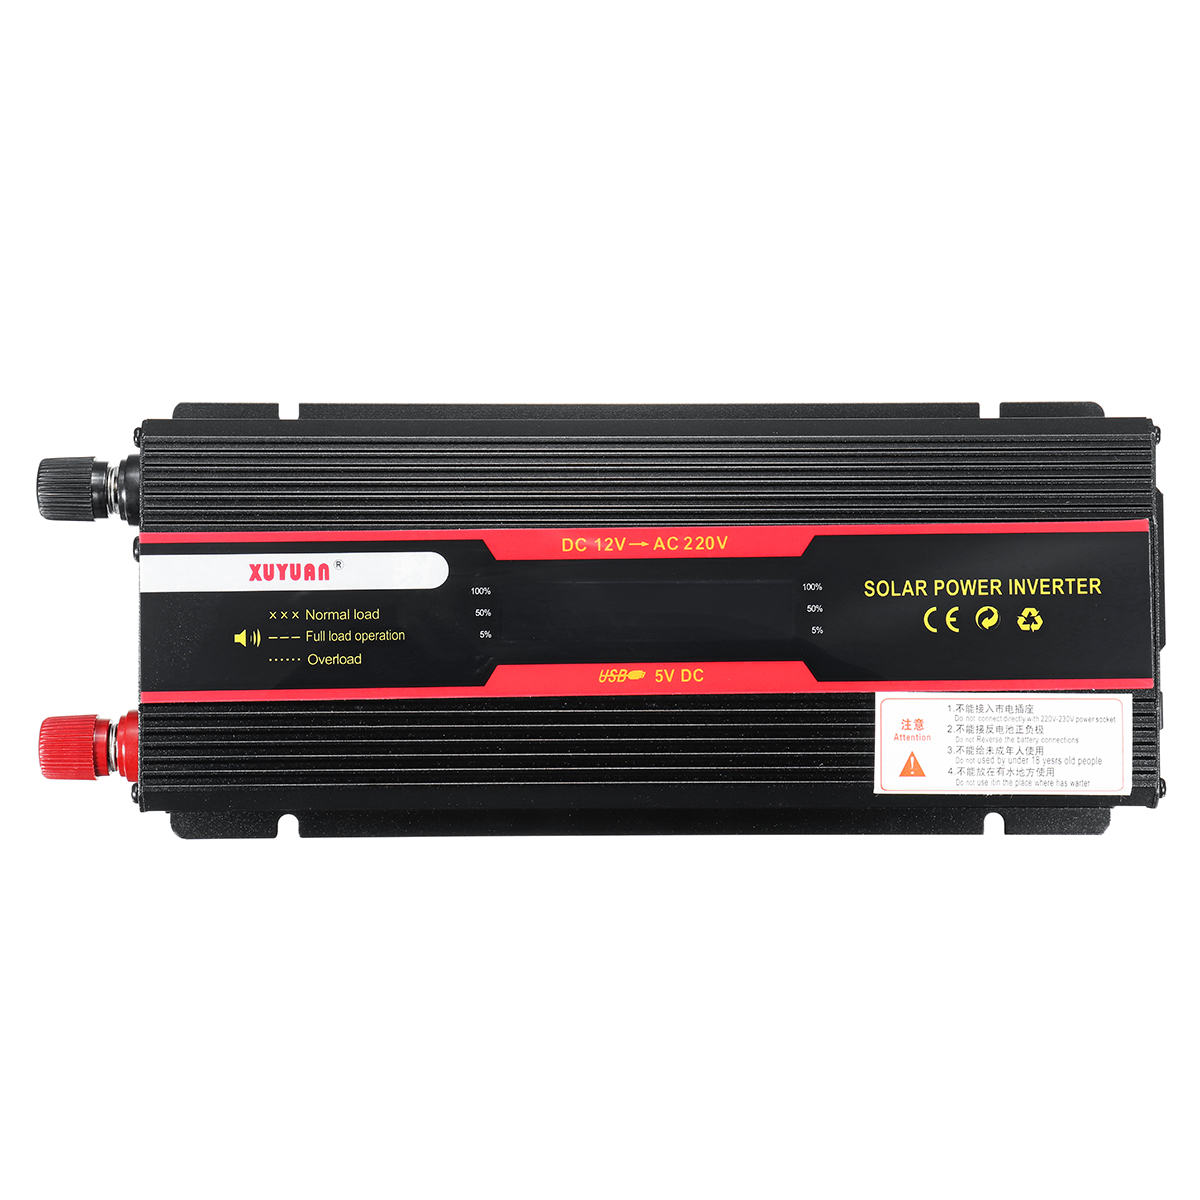 Onduleur de voiture 12 V 220 V 6000 W Pe ak convertisseur de tension convertisseur de tension transformateur 12 V/24 V à 110 V/220 V Inversor + écran LCD - 3